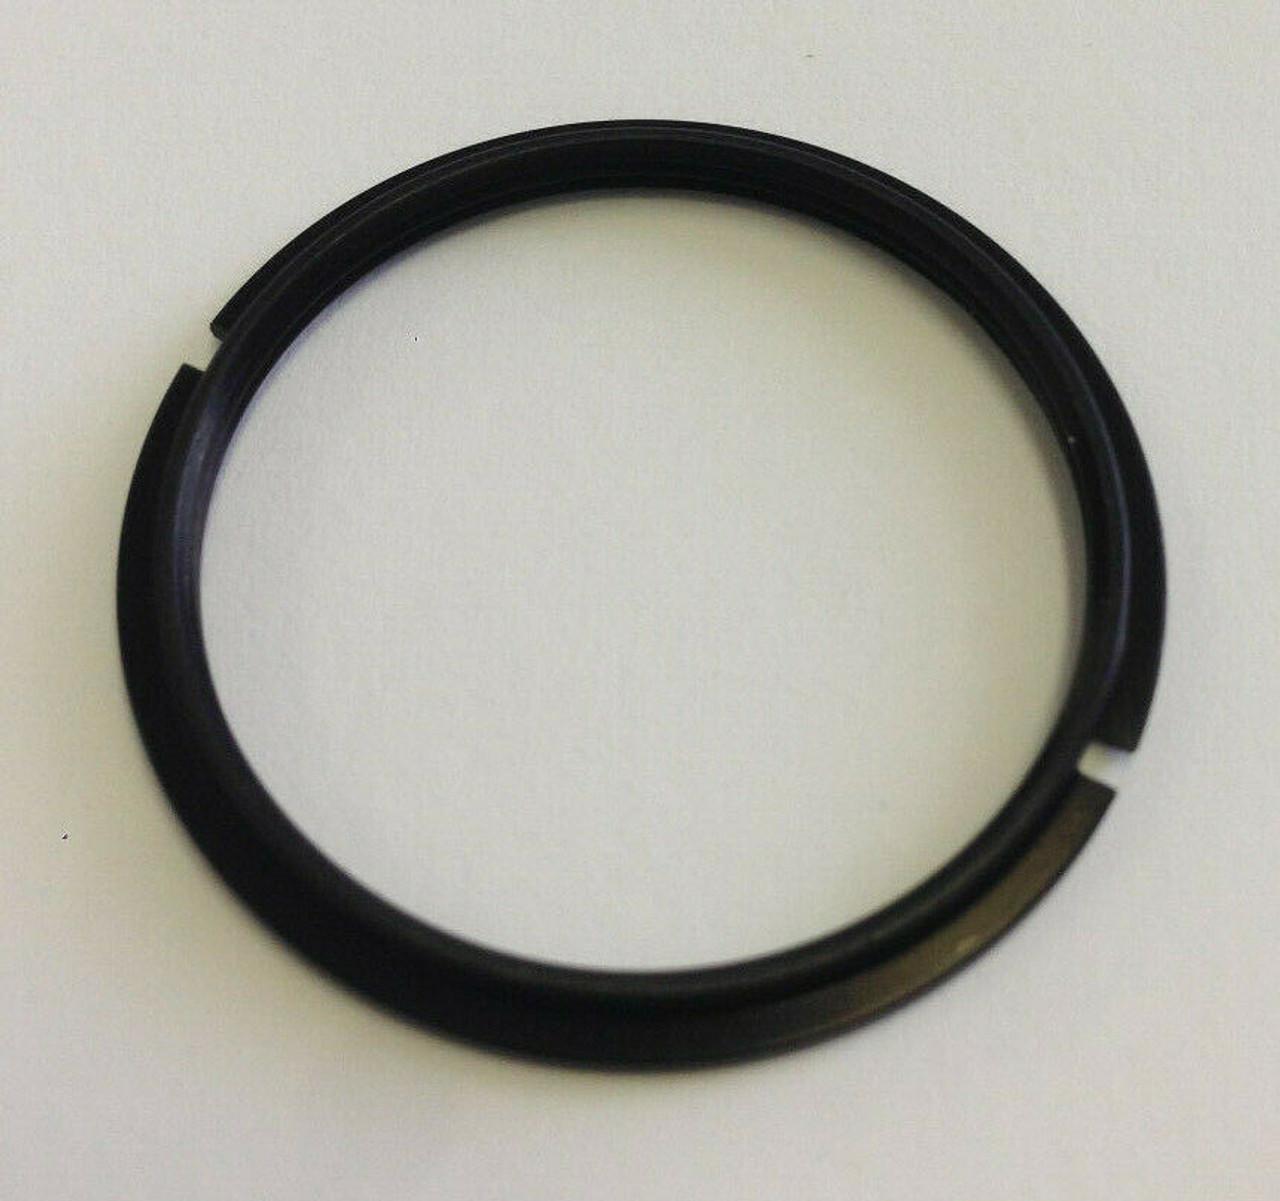 PVS-14 NE6015 Objective Lens Retaining Ring, Close Focus Stop, PN A3144322, NEW